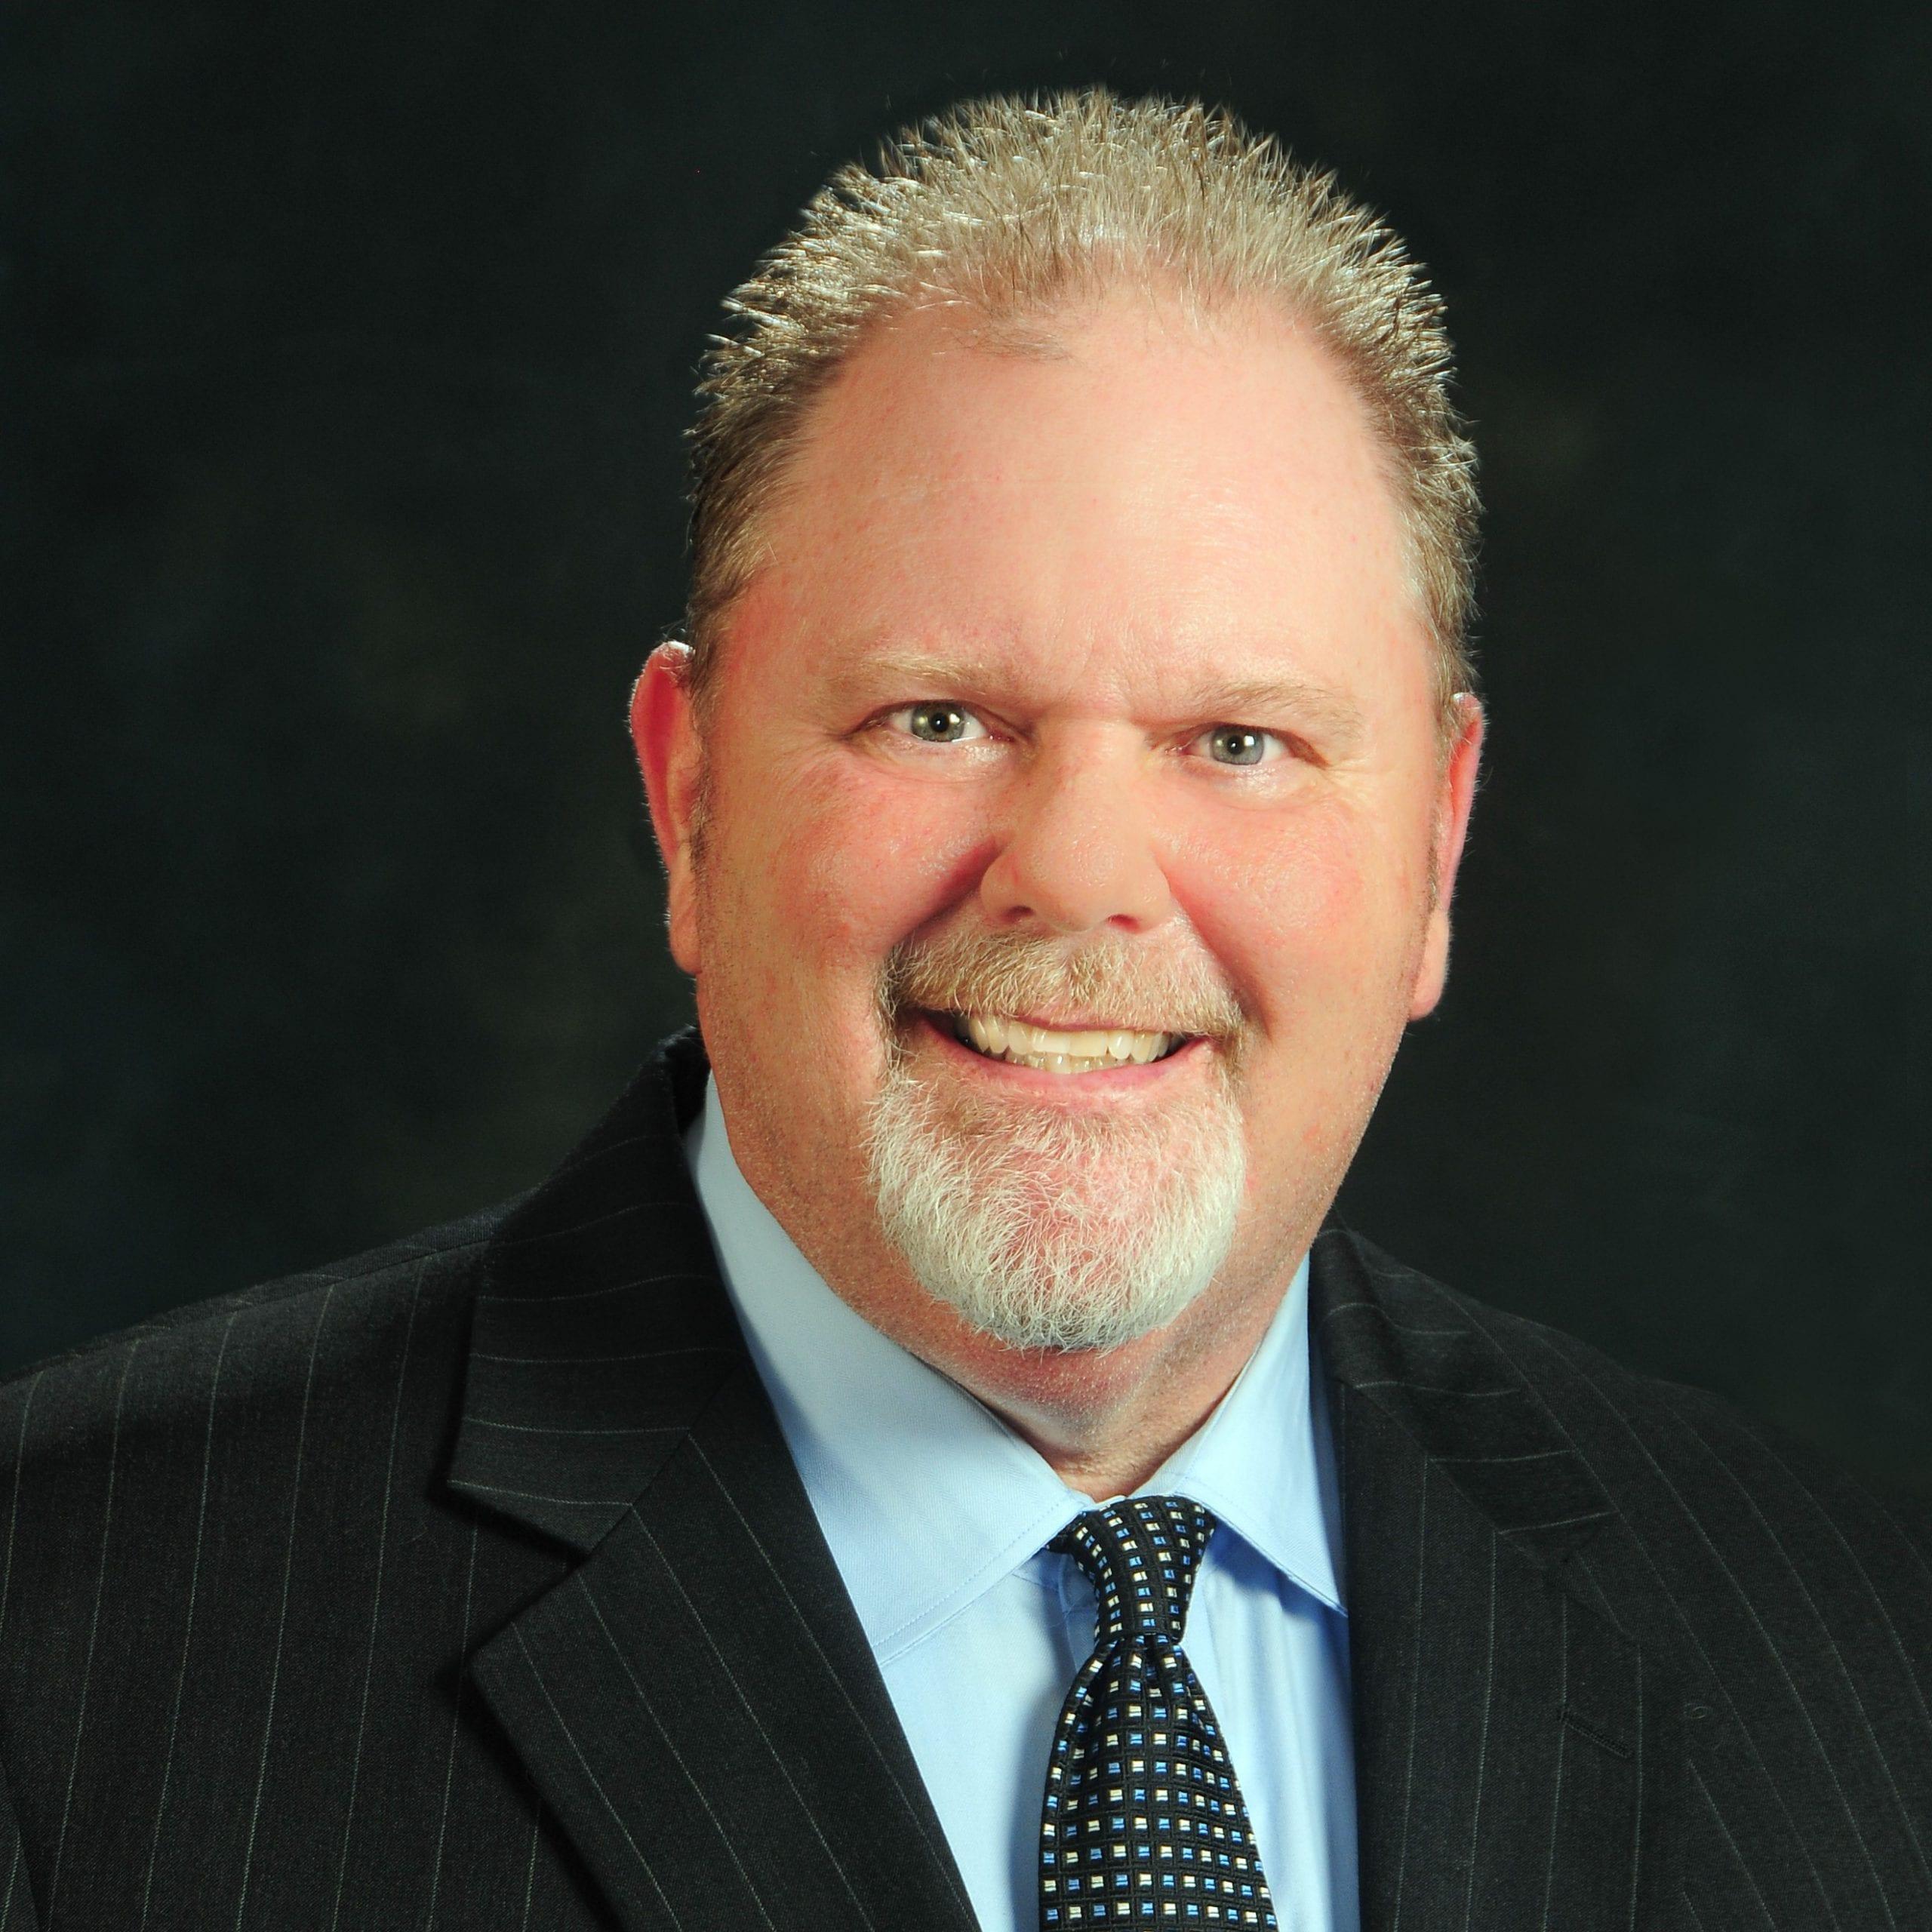 M. Scott Baucom